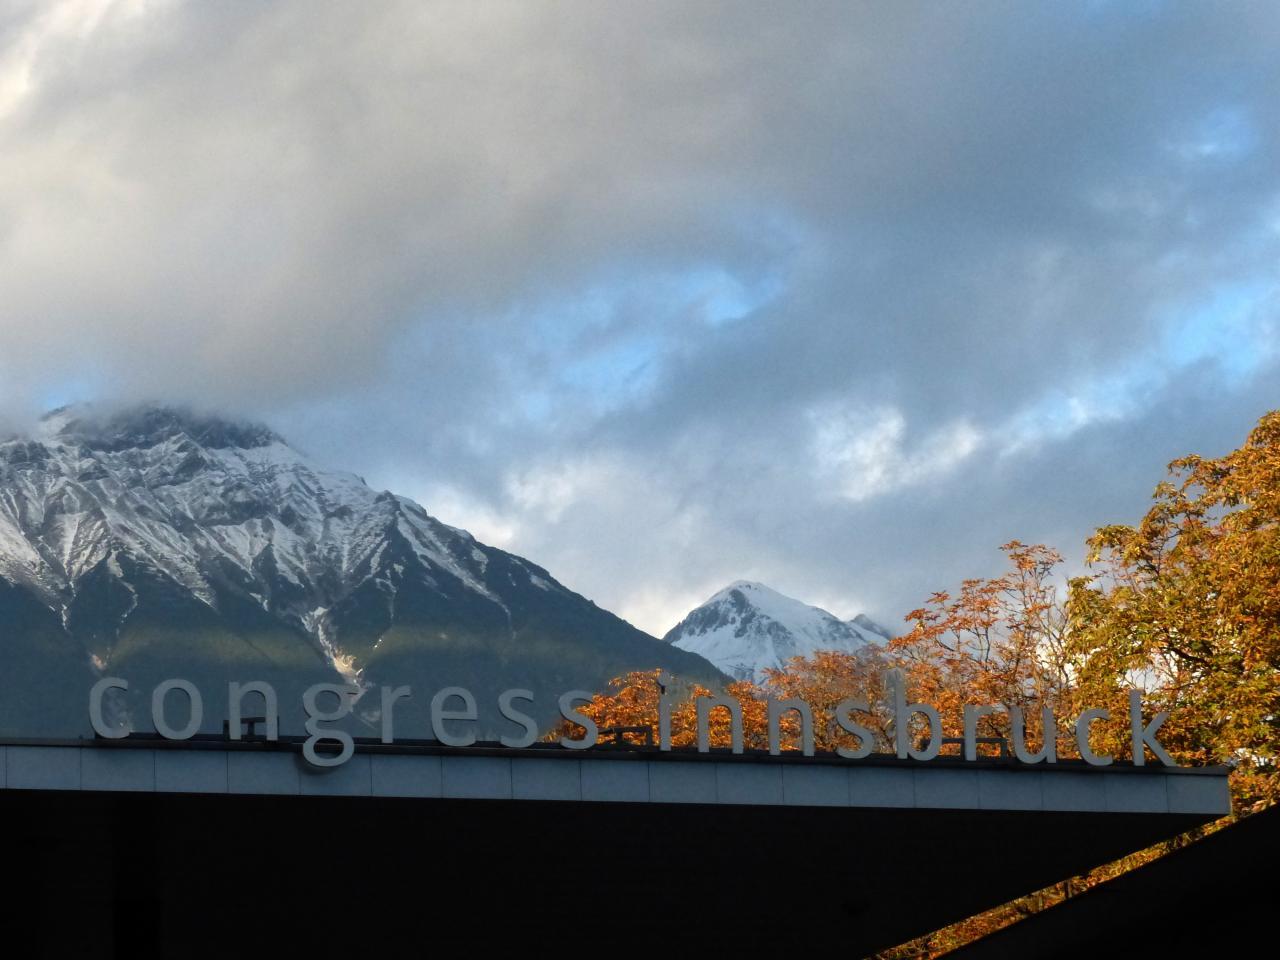 Palais des congrès d'Innsbruck